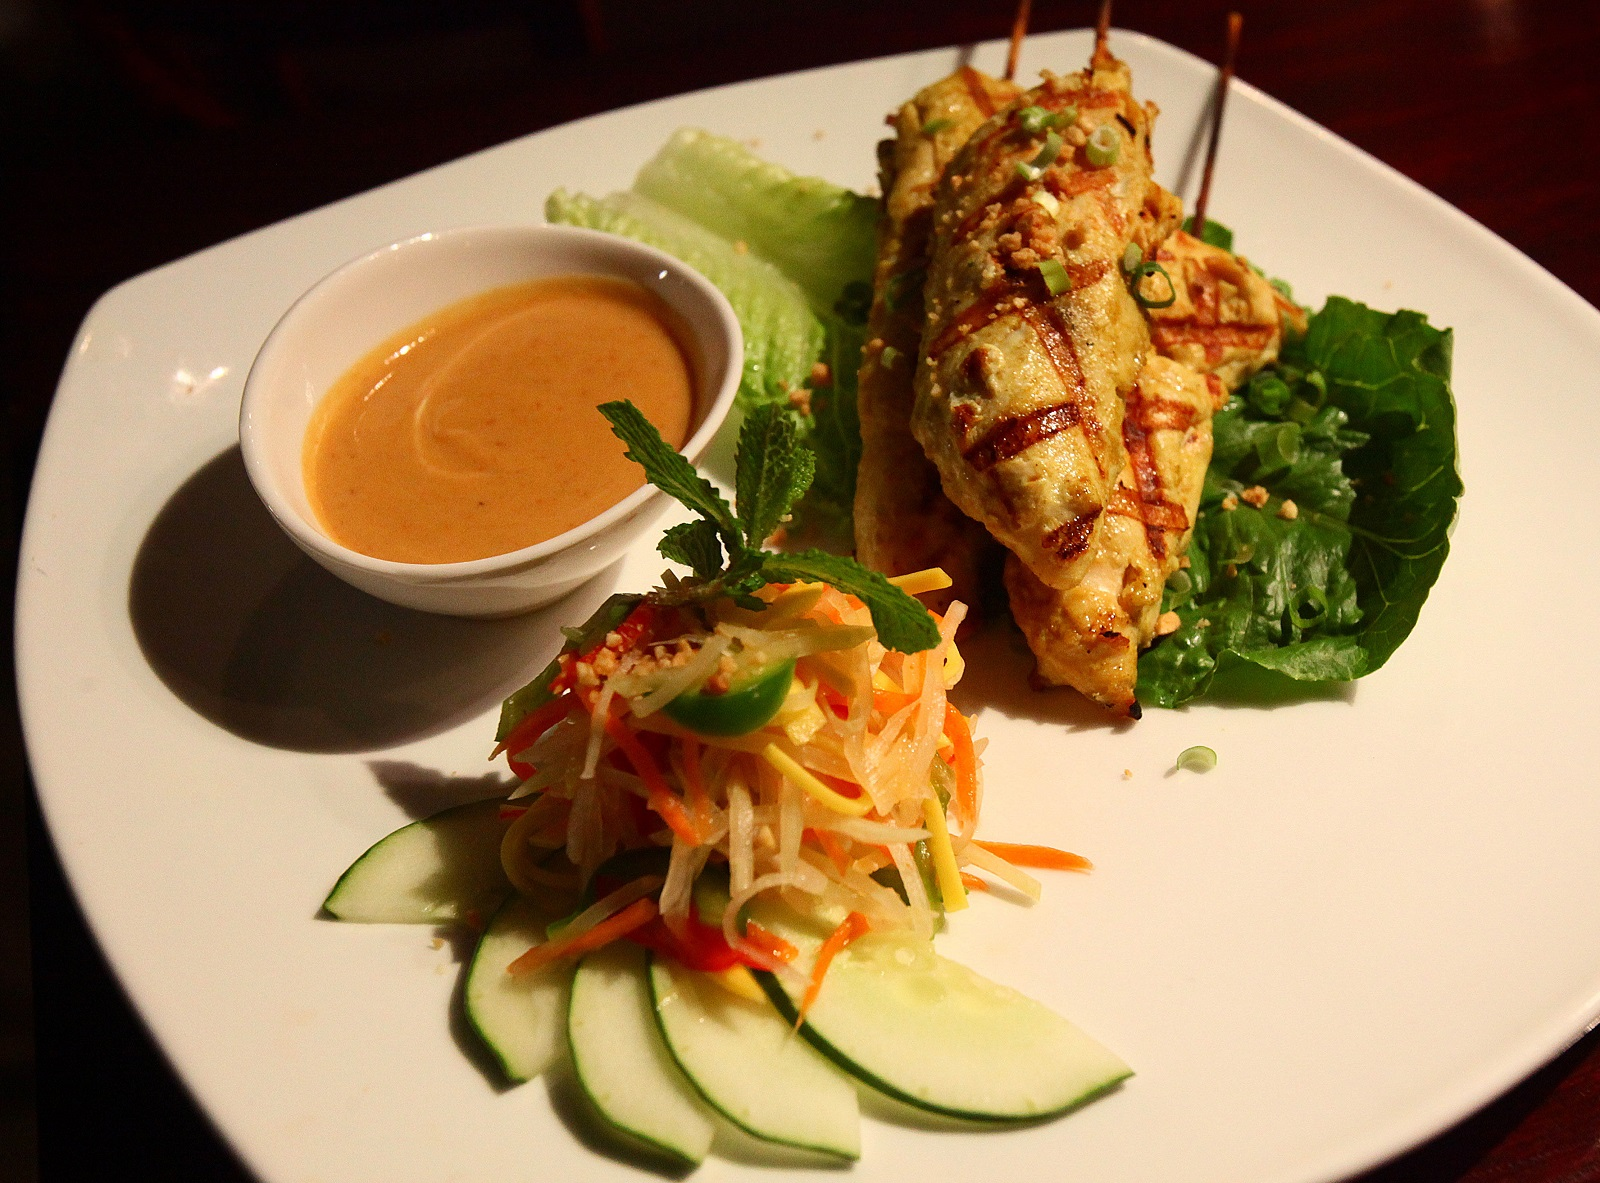 Saigon Bangkok's chicken satay with mango salad on Niagara Falls Boulevard in the Town of Tonawanda. (Robert Kirkham/Buffalo News)